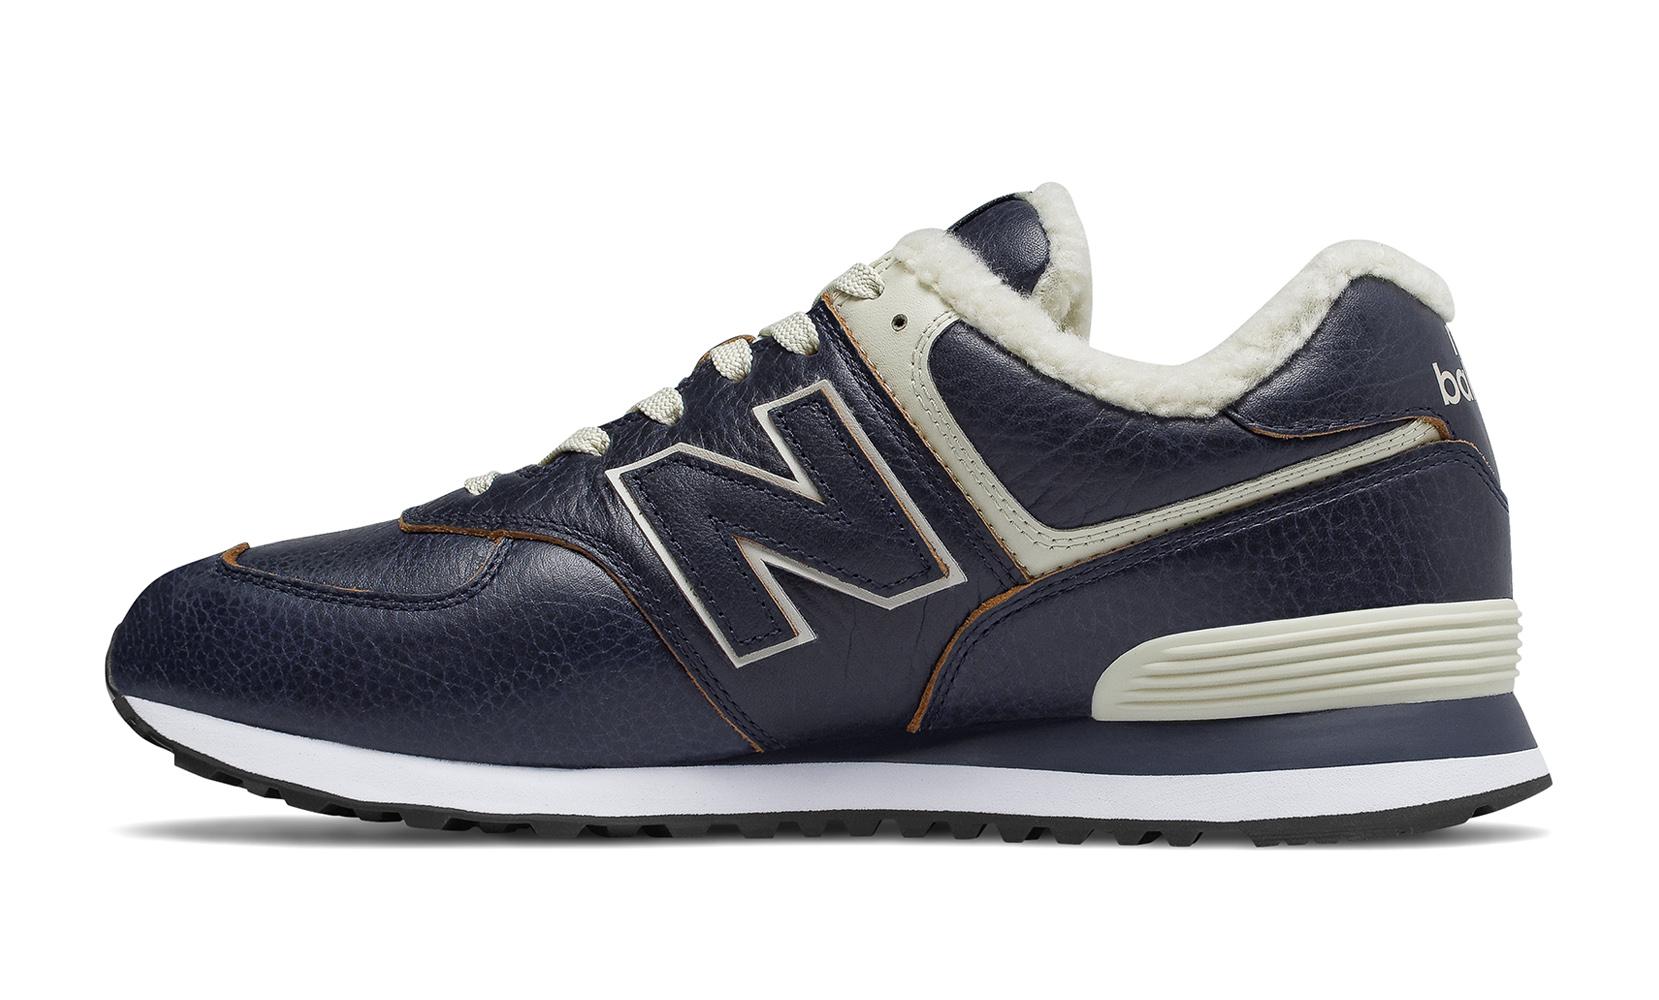 New Balance 574 FUR ML574WNF | New Balance